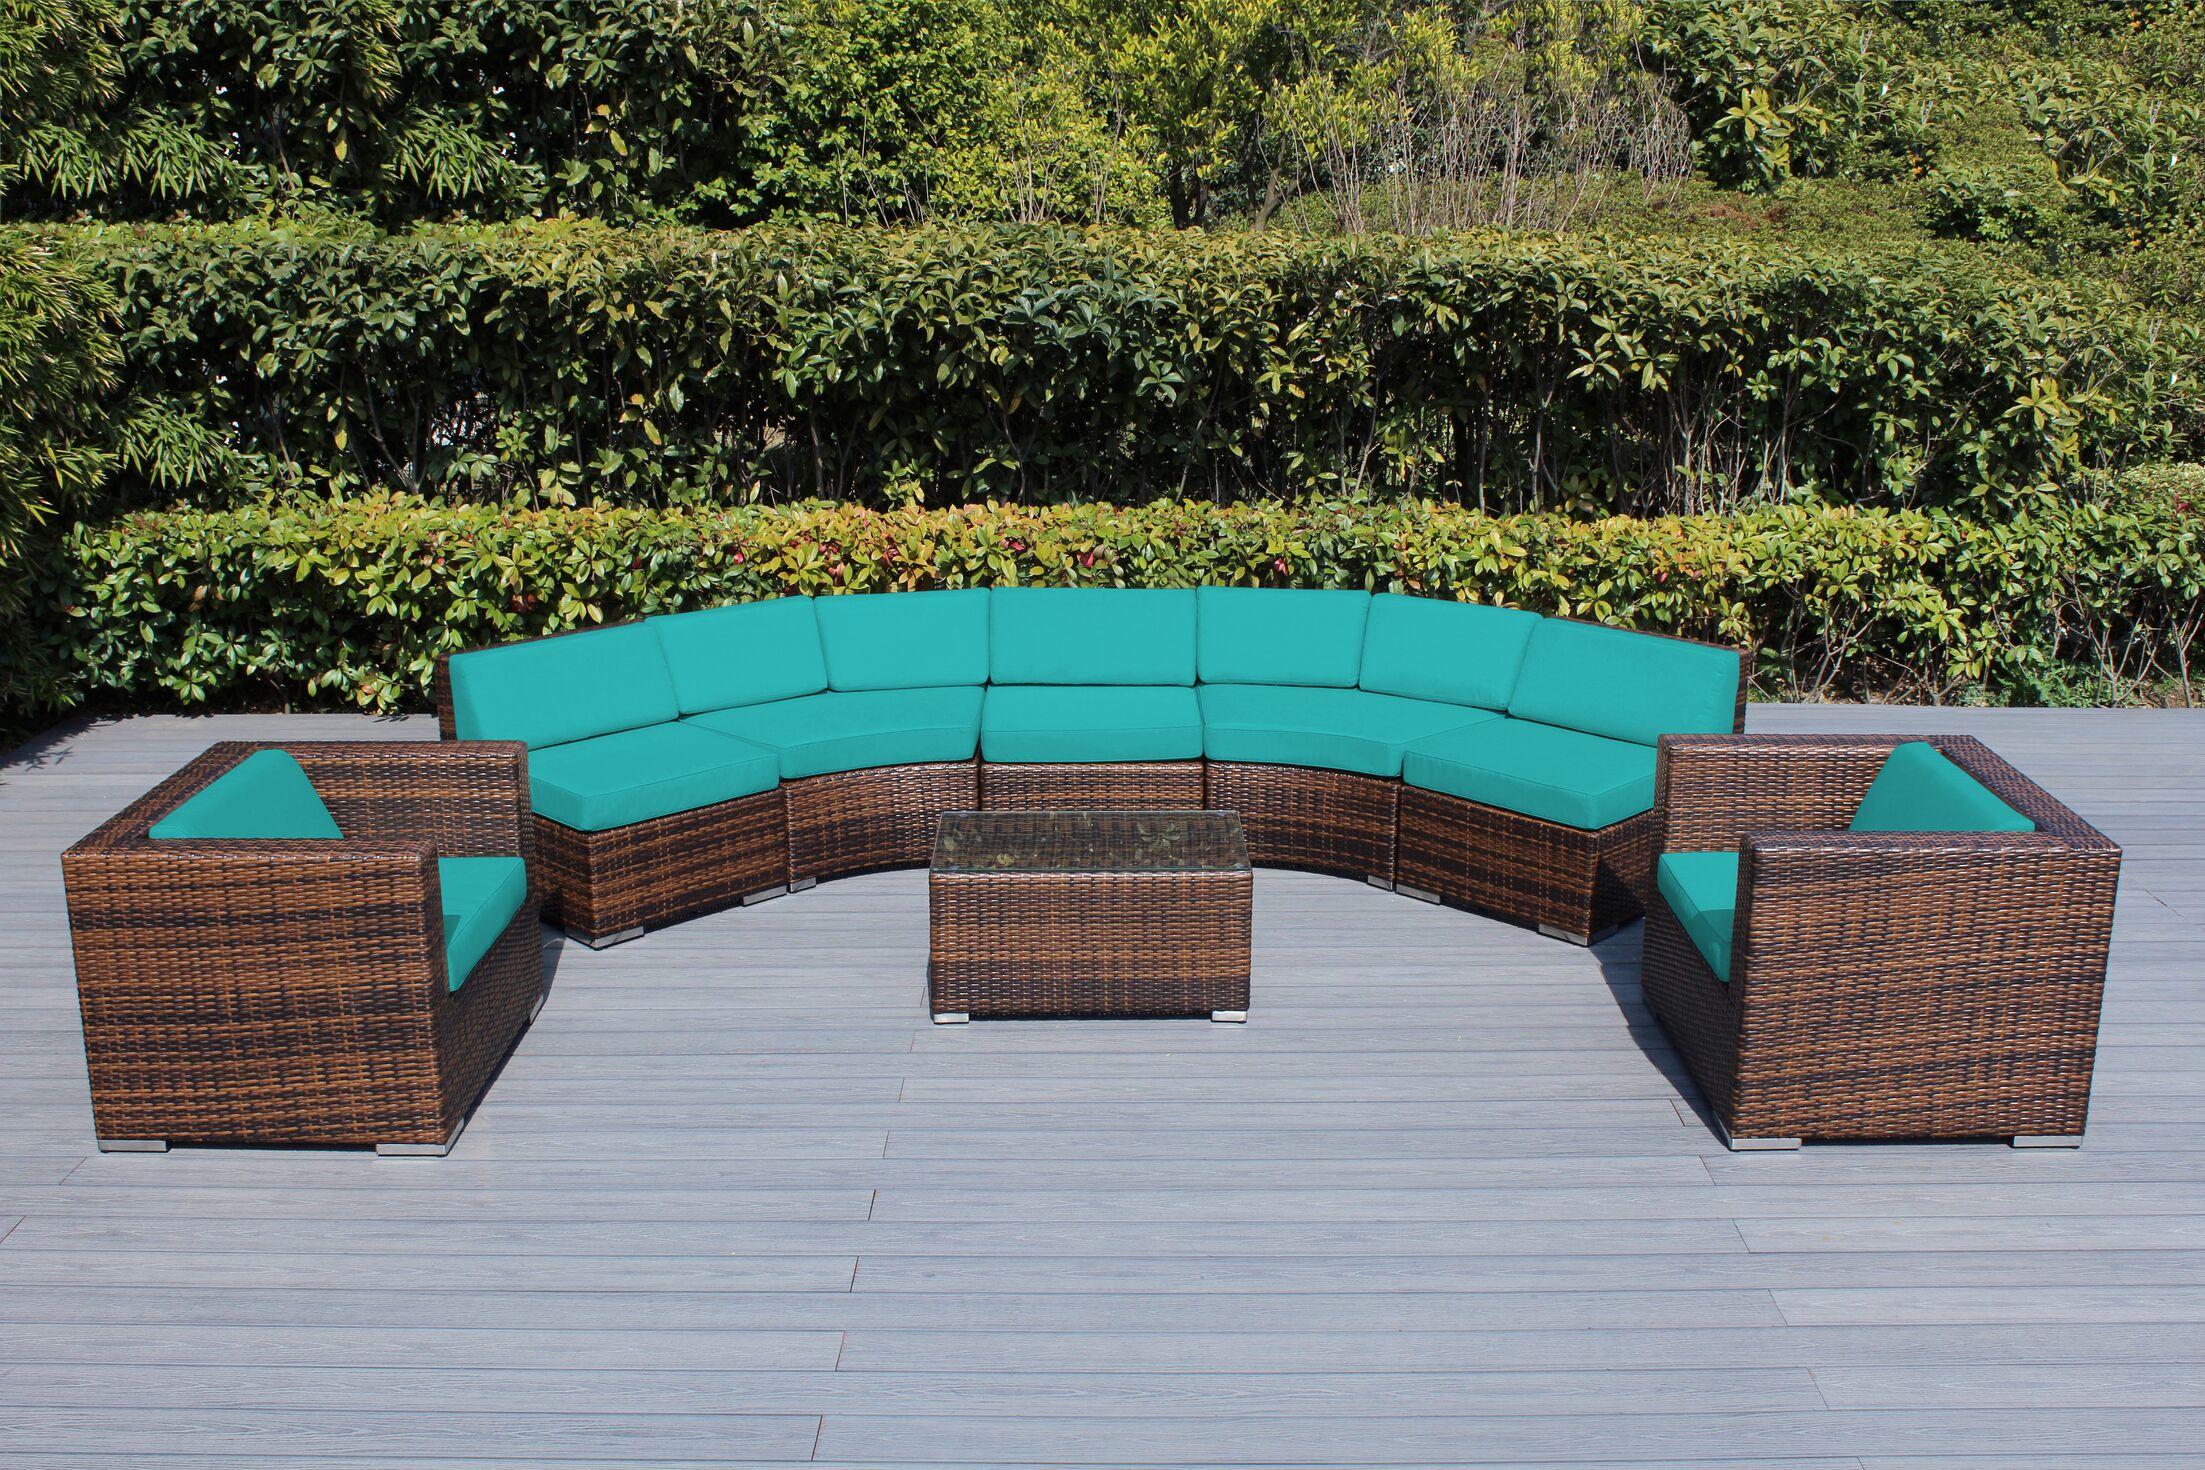 Baril Curved 8 Piece Sunbrella Sectional Set with Cushions Cushion Color: Aruba